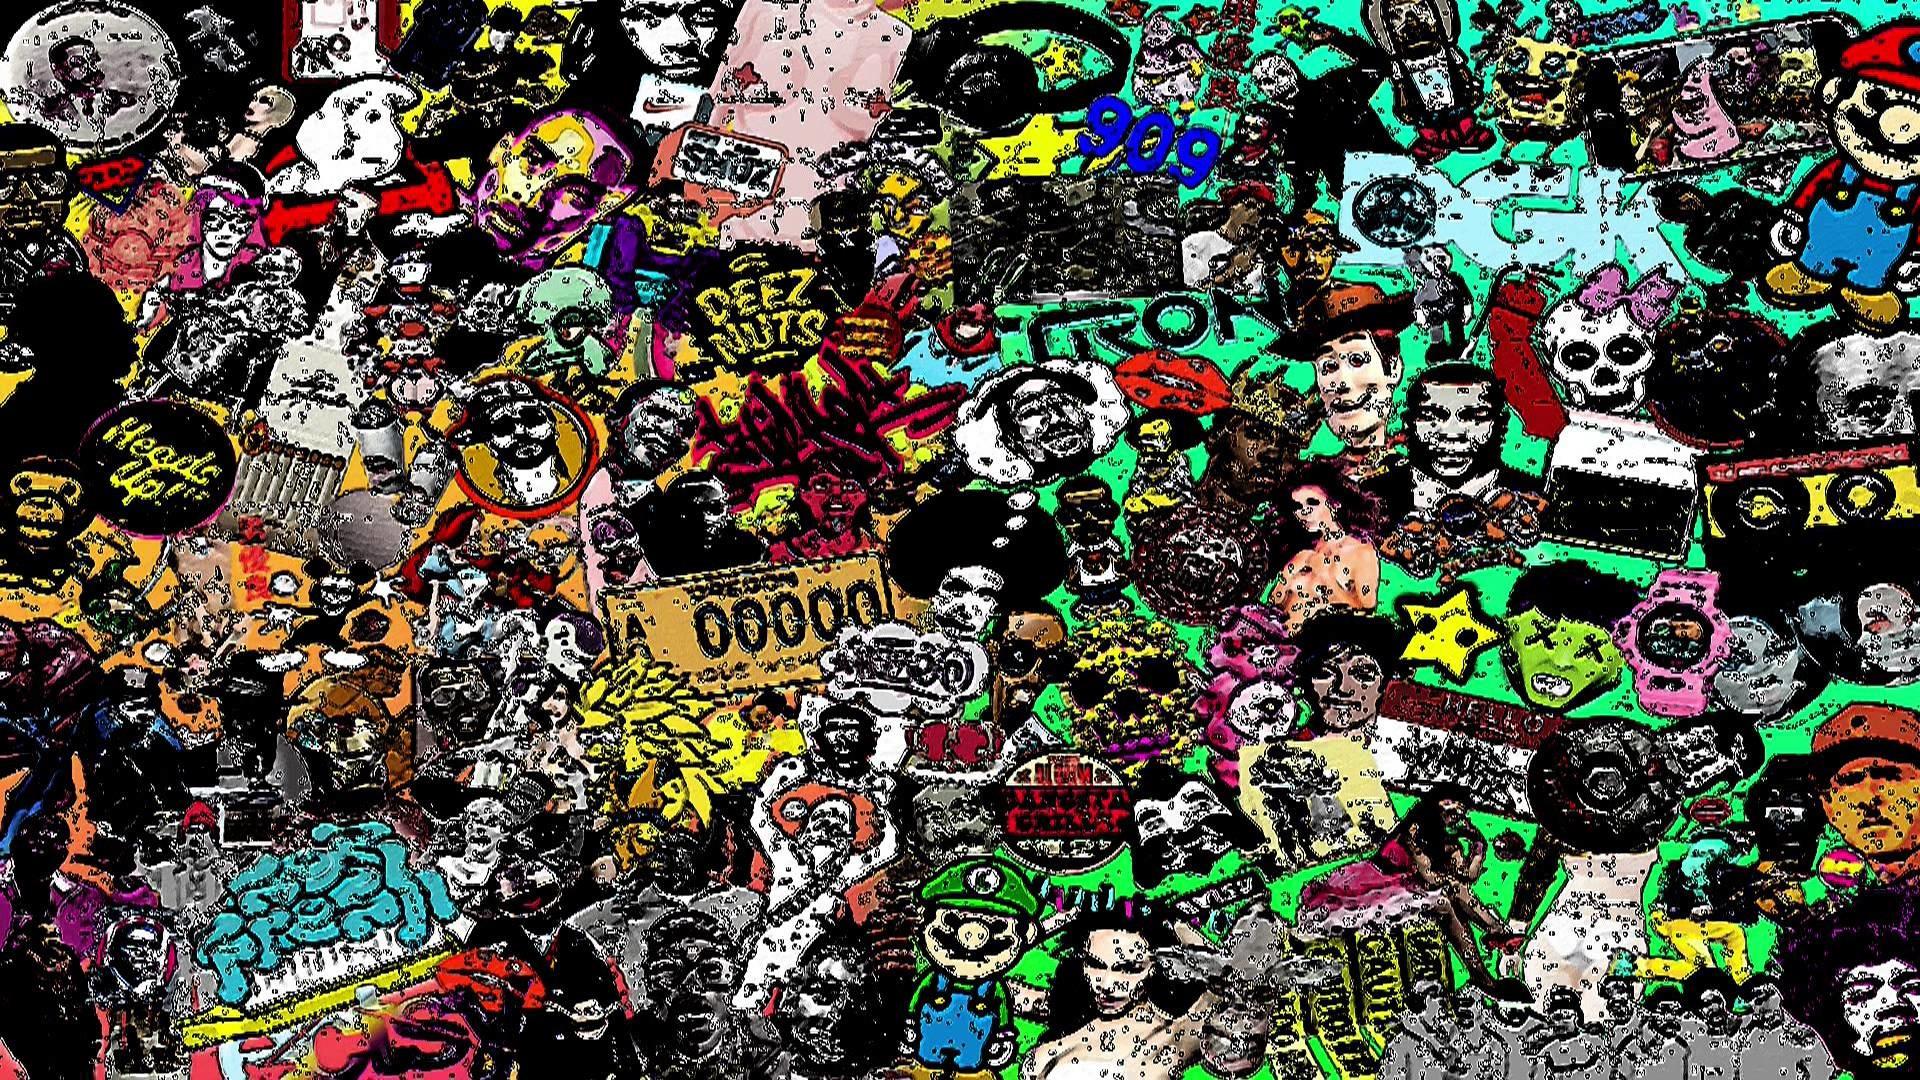 Res: 1920x1080, Acid Trip Backgrounds - Wallpaper Cave